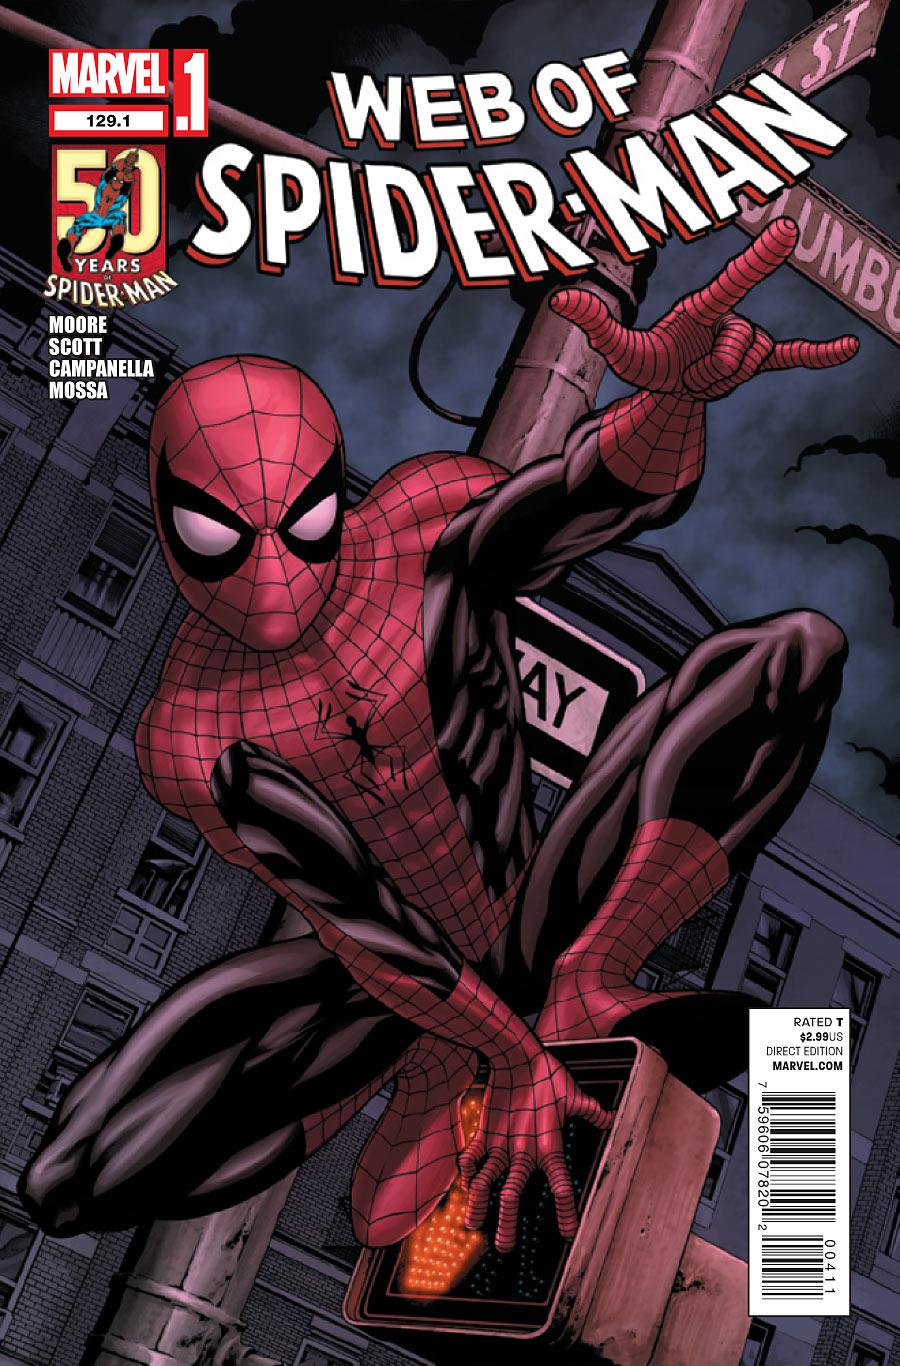 Web of Spider-Man Vol 1 129.1